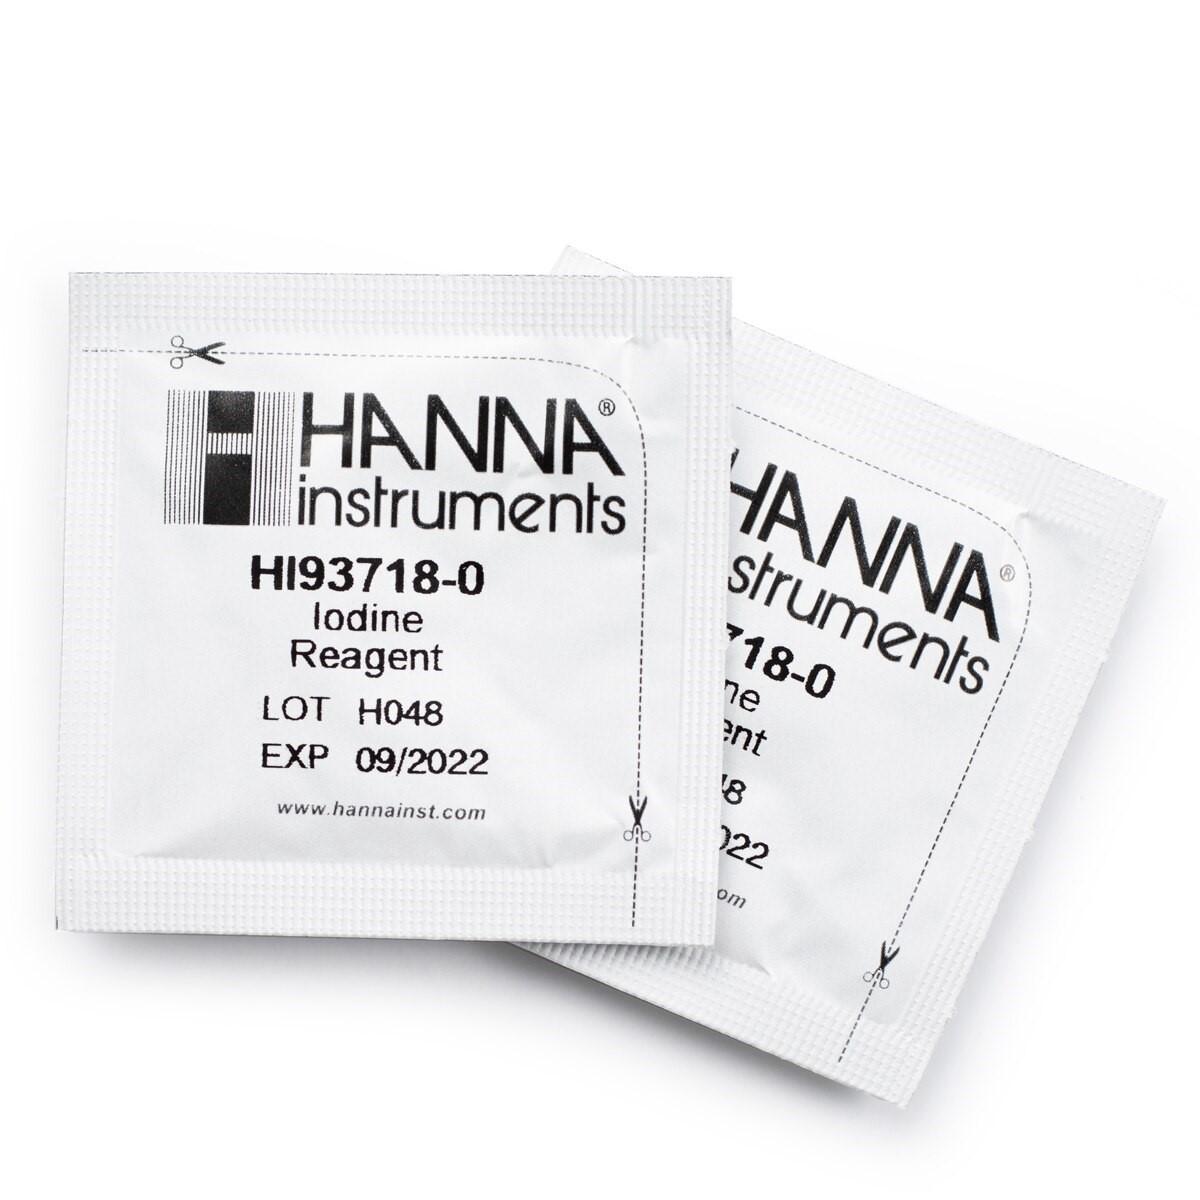 HI93718-01 Iodine Reagents (100 tests)